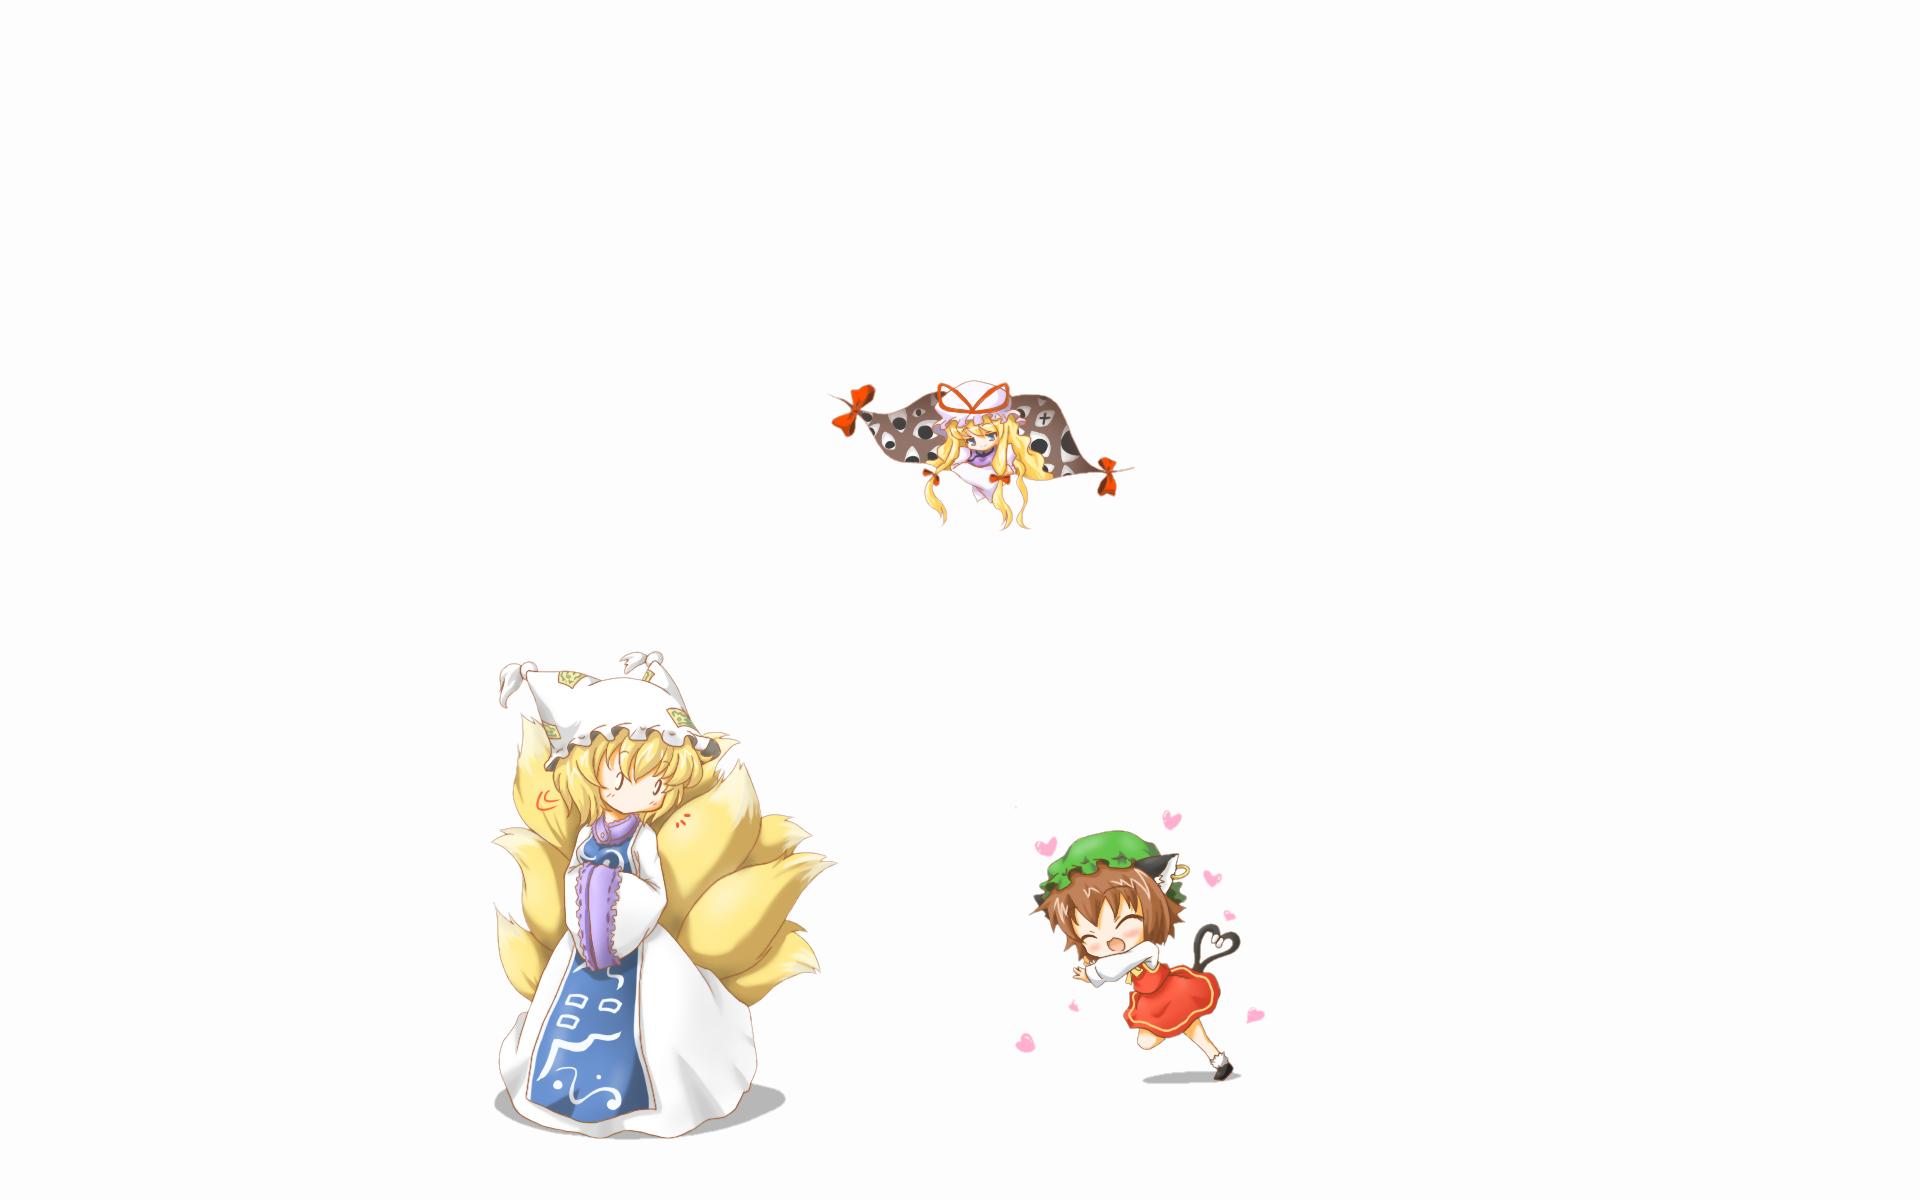 animal_ears catgirl chen chibi foxgirl multiple_tails neko_yume tail touhou white yakumo_ran yakumo_yukari